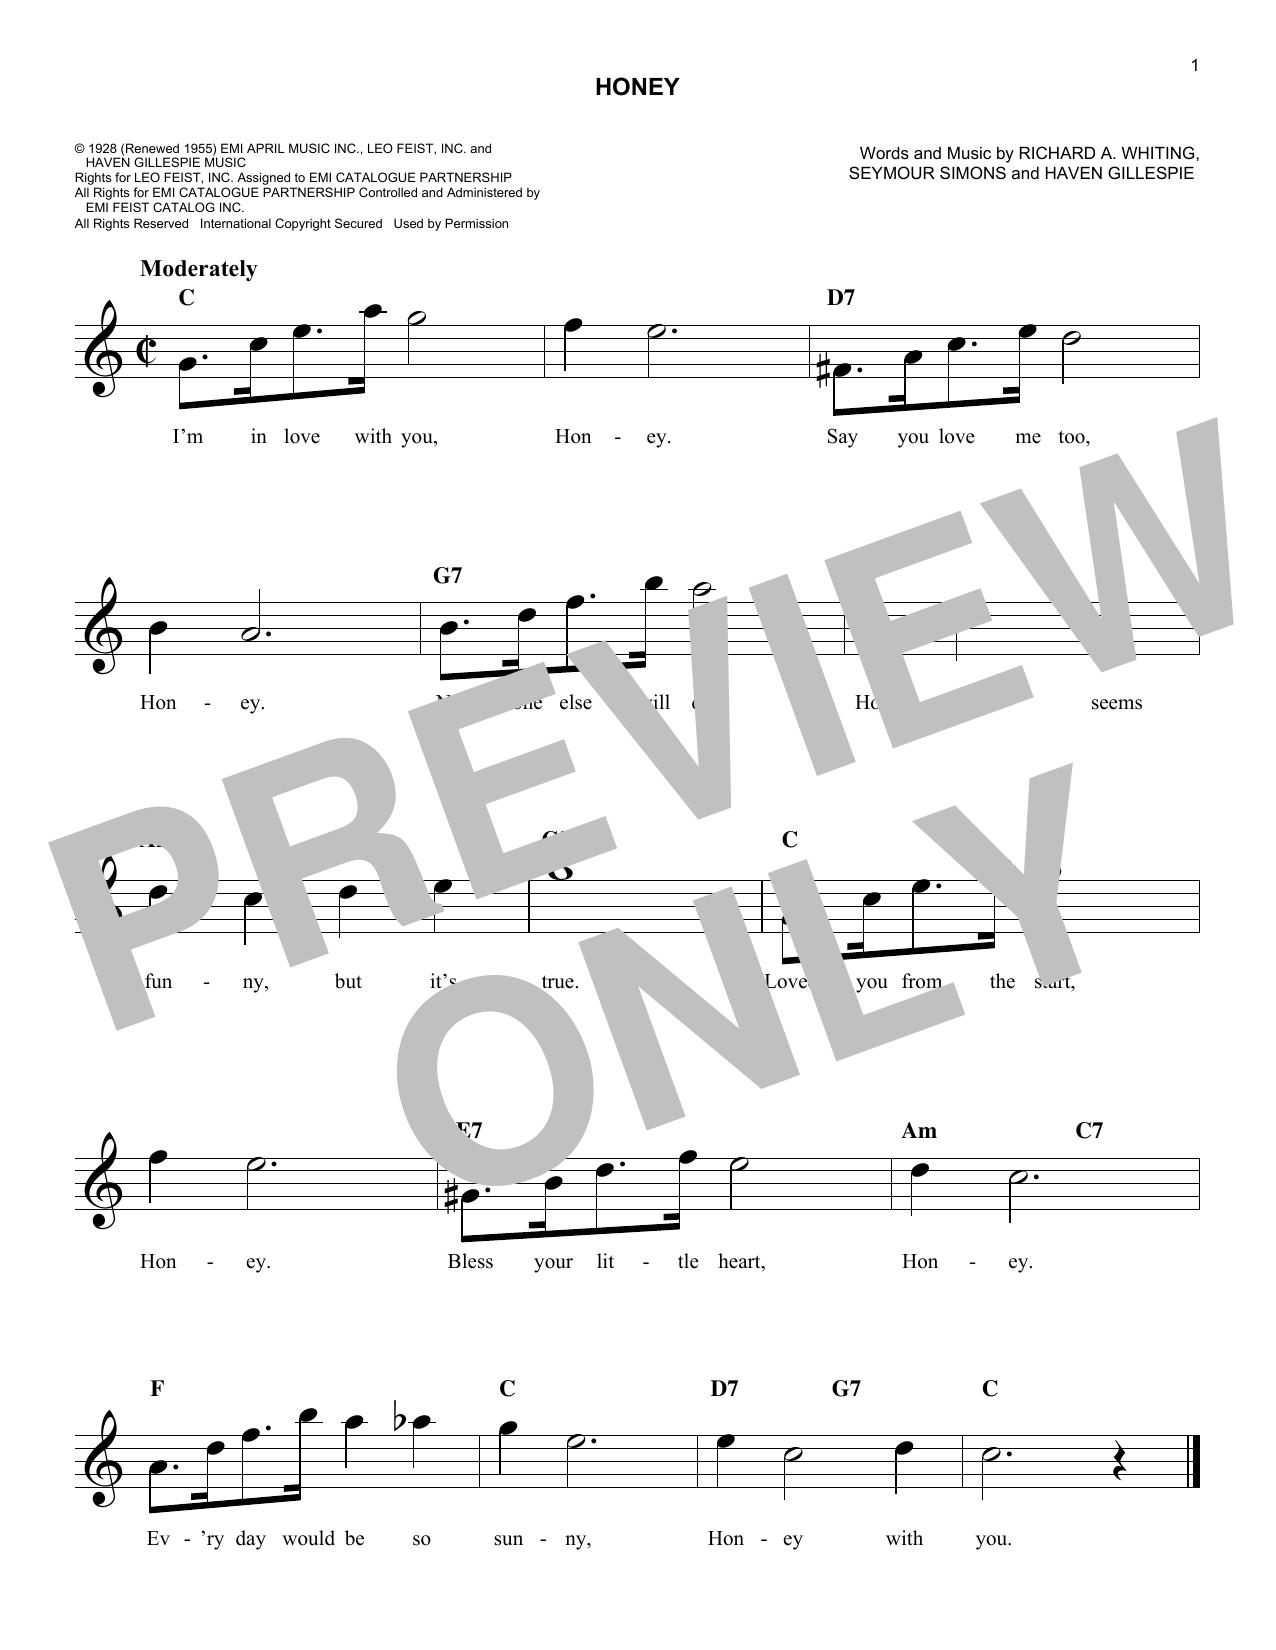 Seymour Simons Honey sheet music notes and chords. Download Printable PDF.